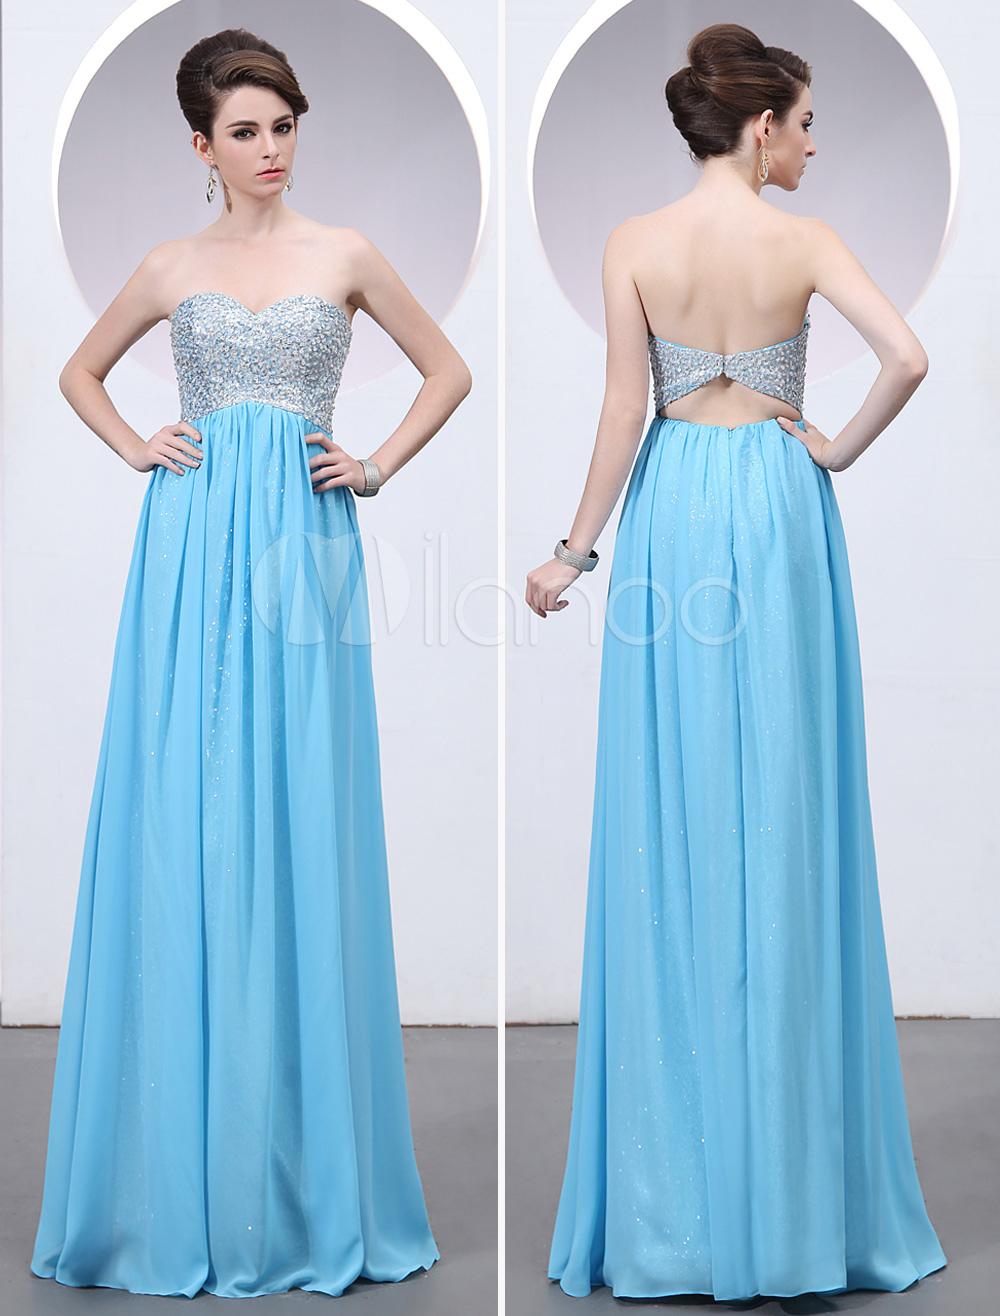 Modern Blue Sweetheart Neck Sequin A-line Chiffon Prom Dress (Wedding Prom Dresses) photo